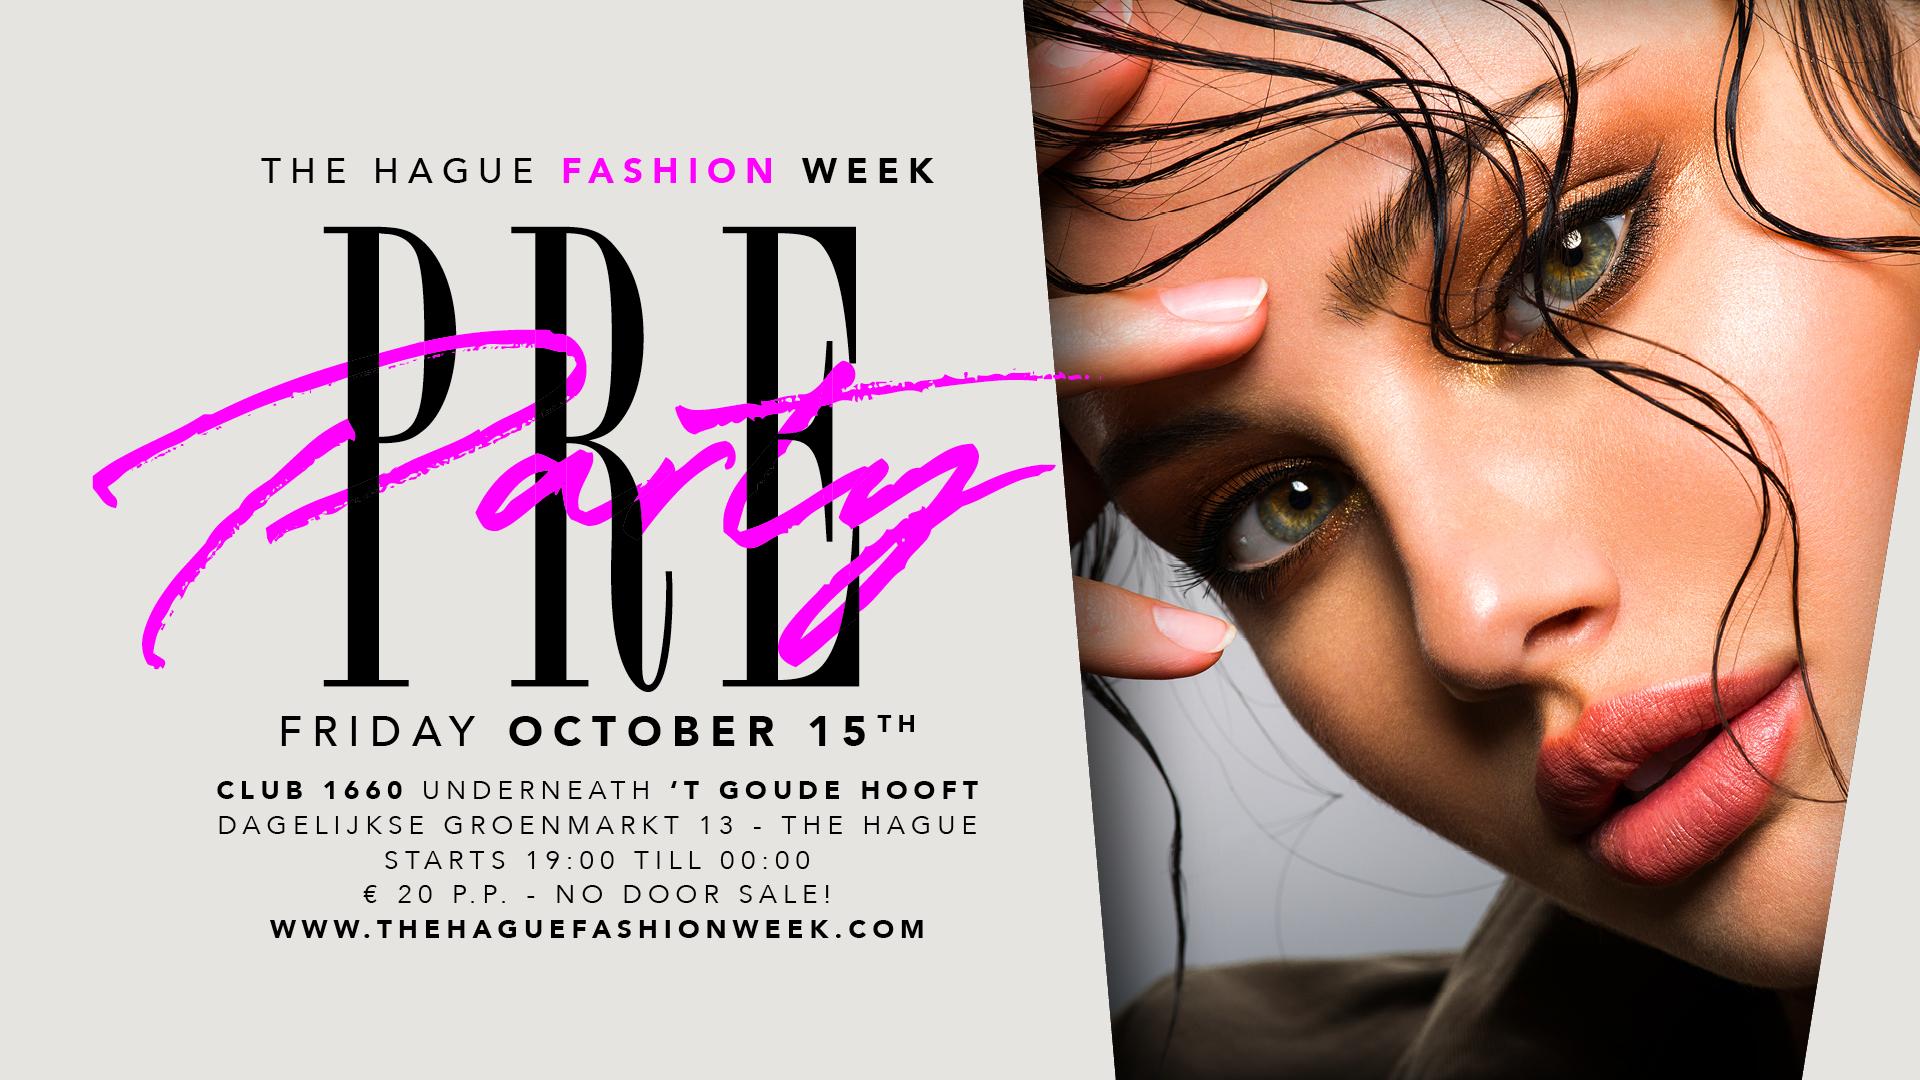 2021-10-15 The Hague Fashion week |Club 1660 |Den Haag